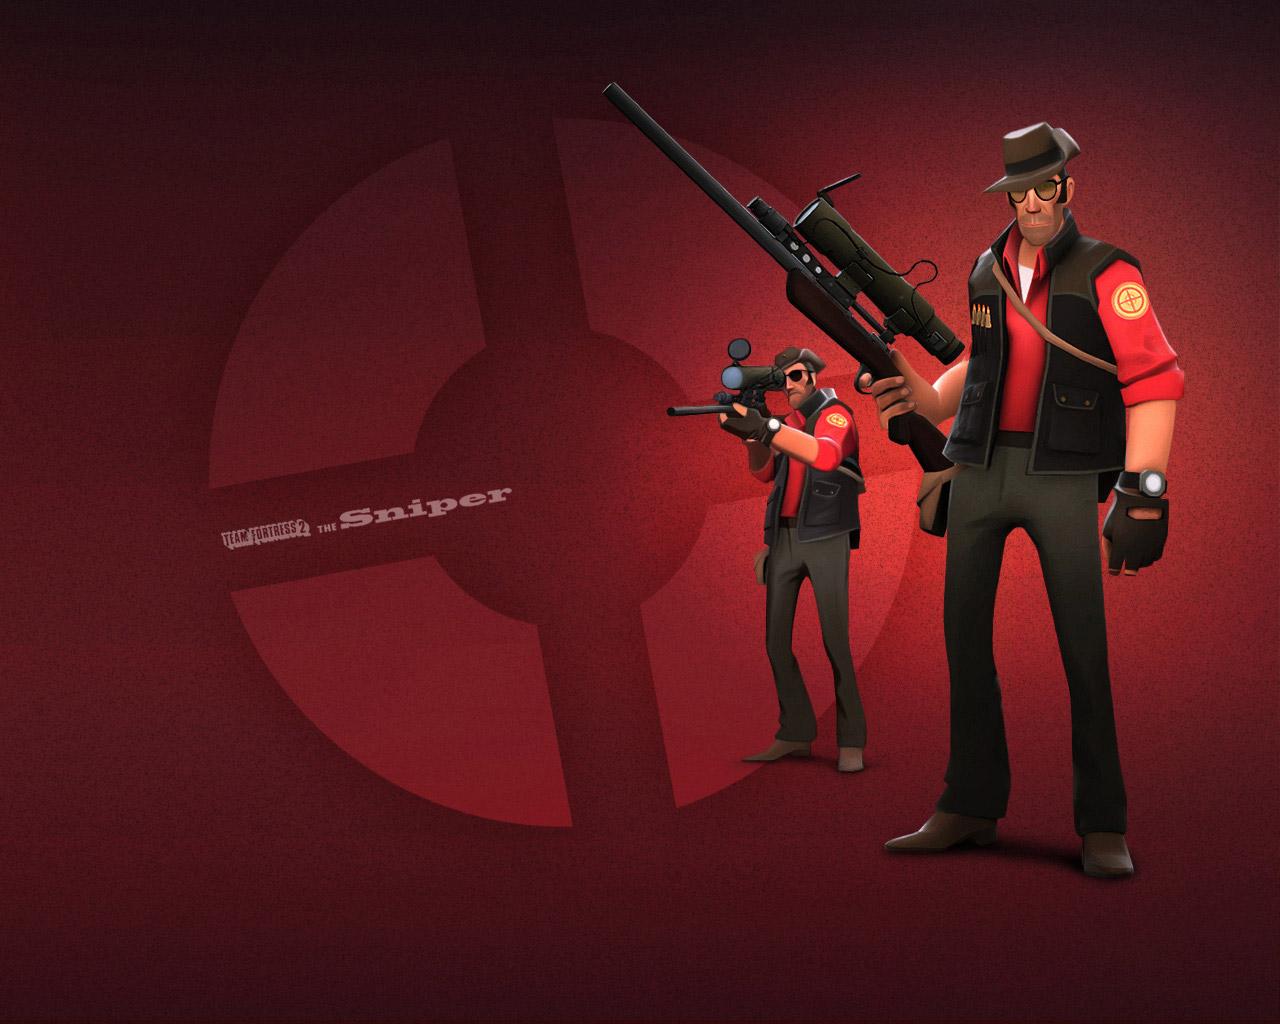 Team Fortress 2 Wallpaper in 1280x1024